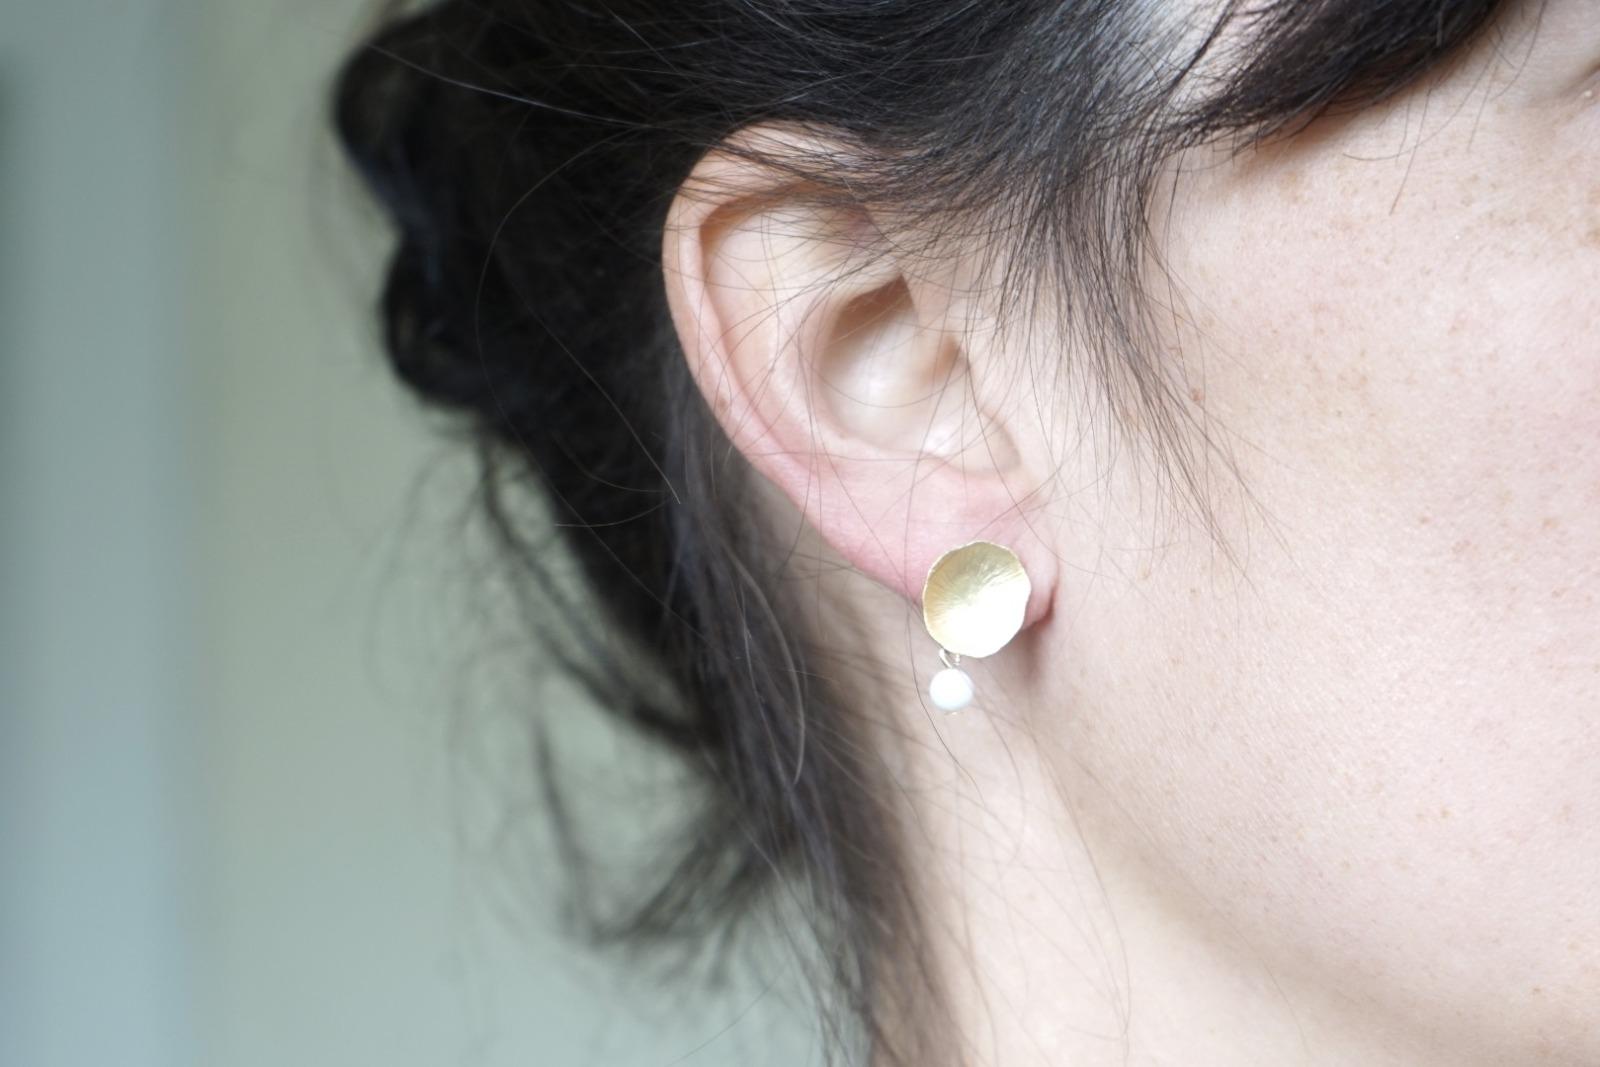 Ohrringe Ohrstecker Lotusblatt silber mit Perle Amethyst - 3